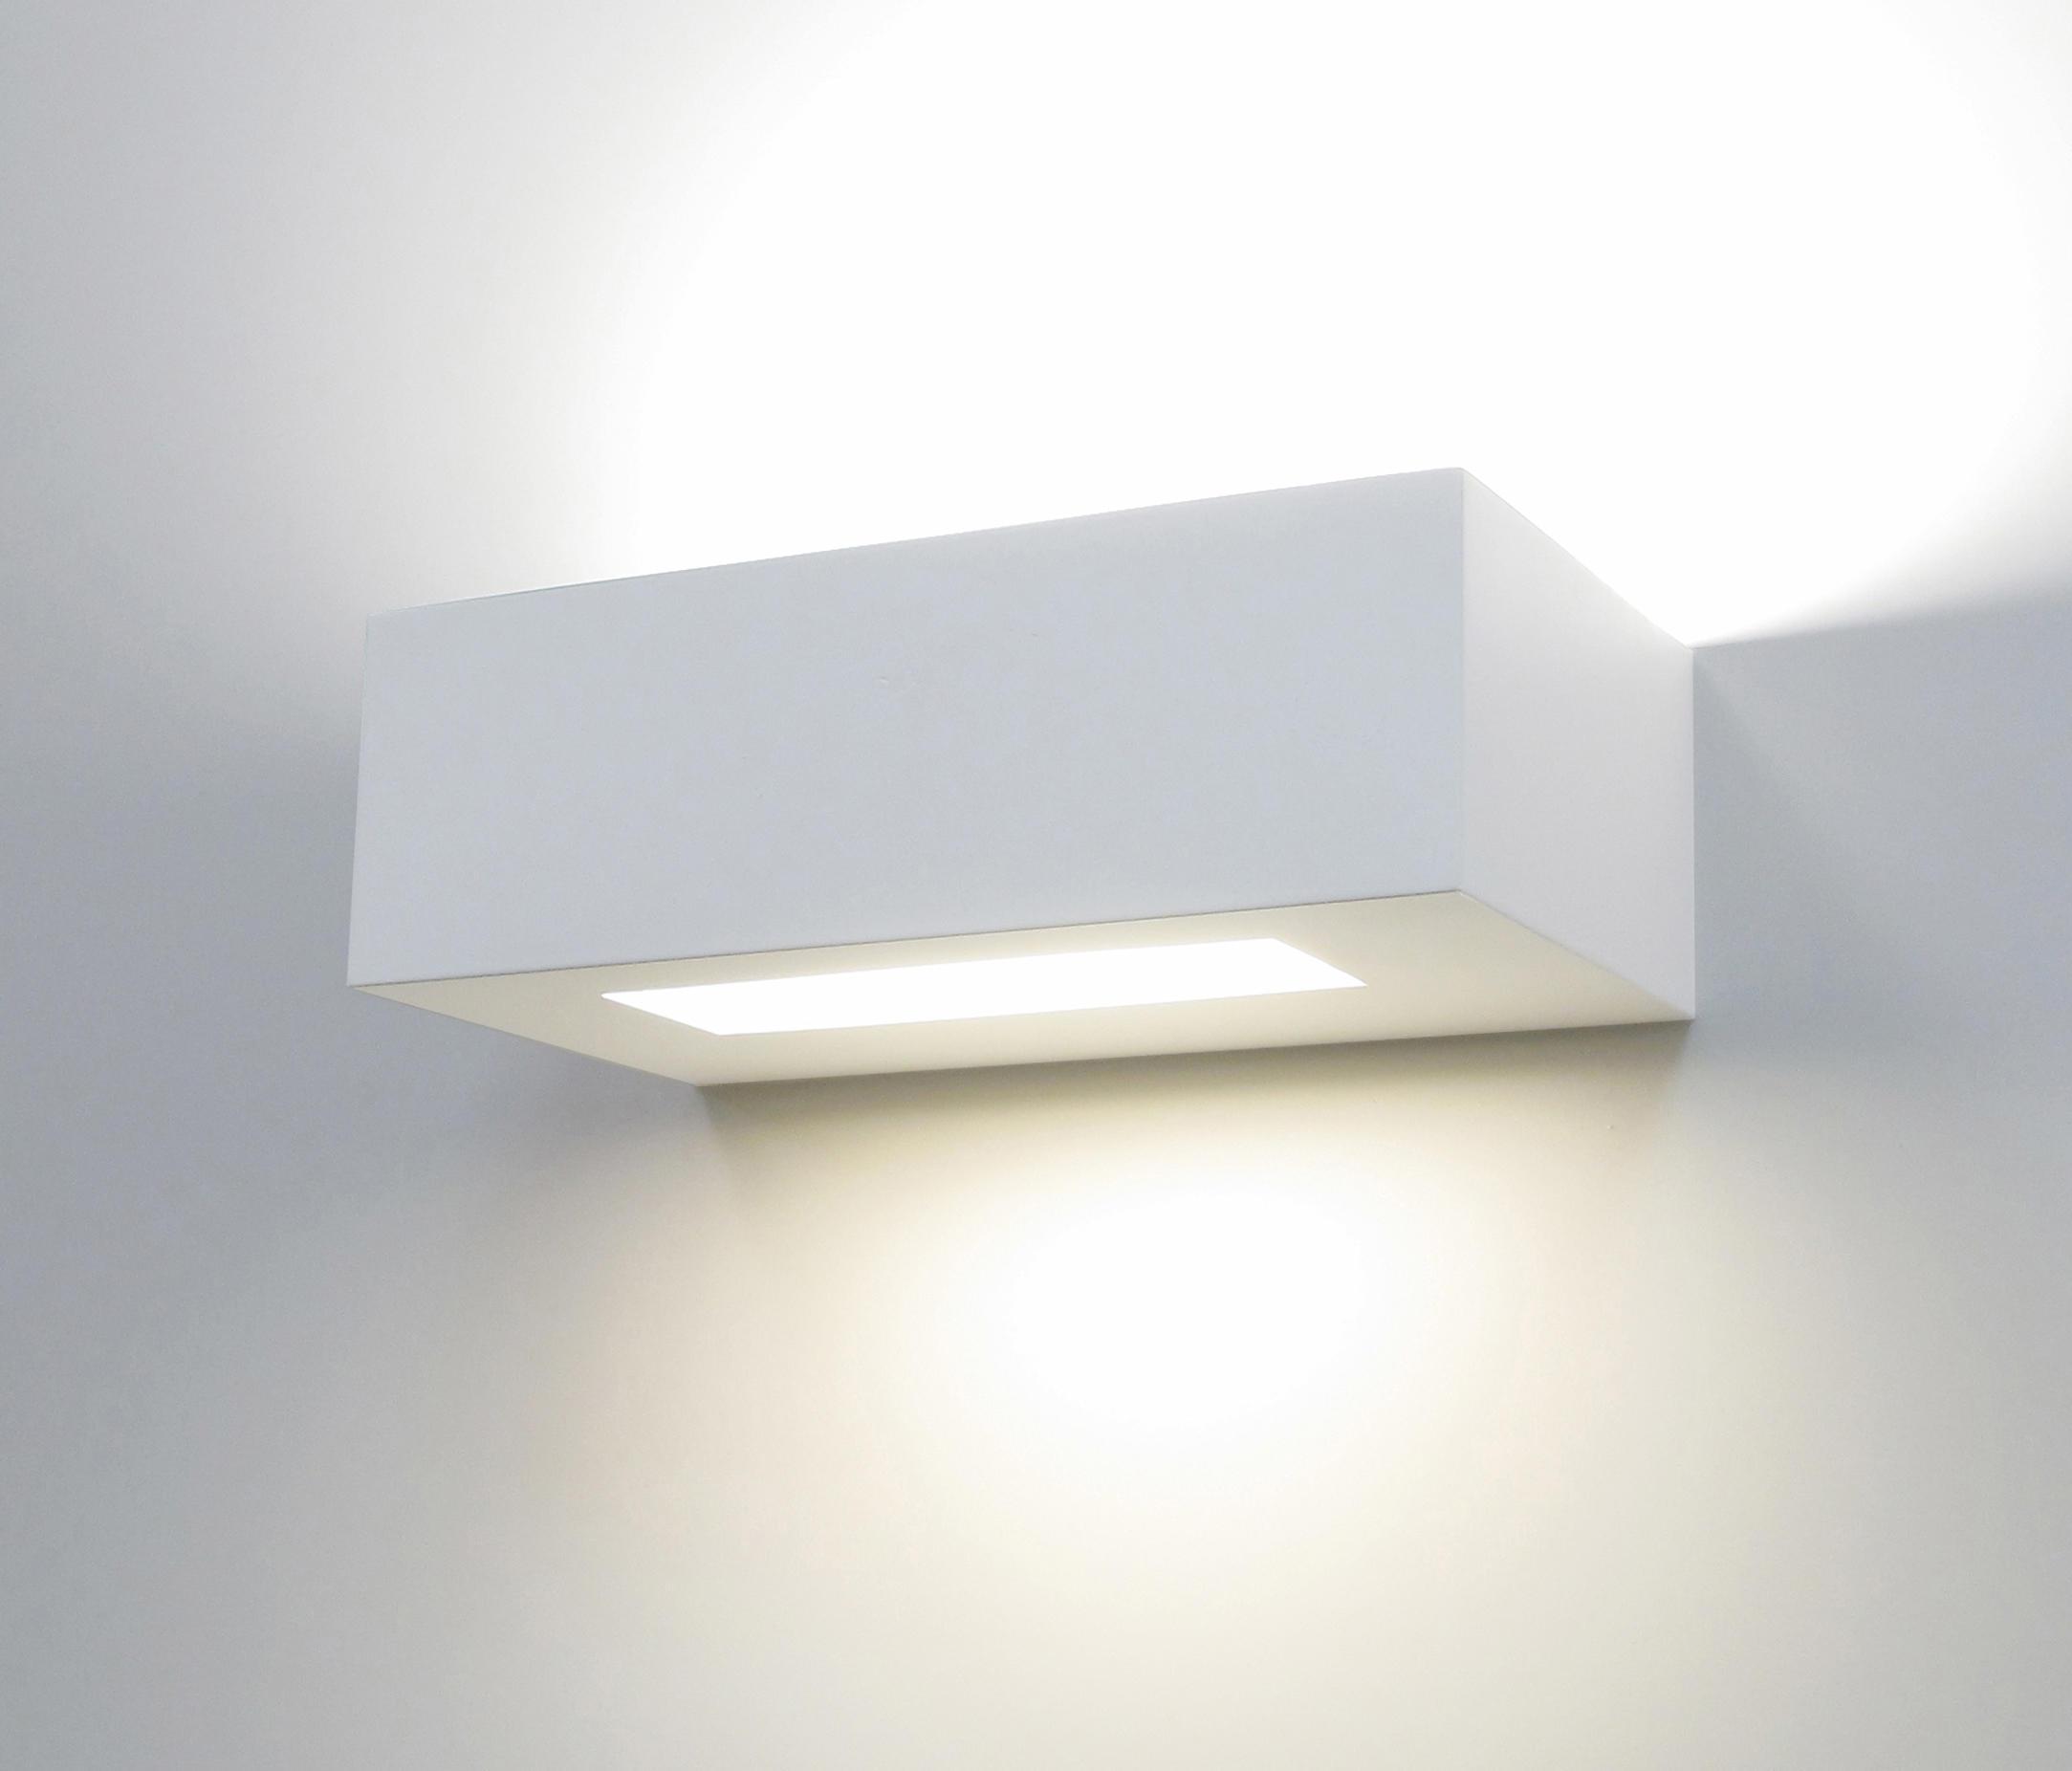 3076 saqqara power general lighting from atelier sedap. Black Bedroom Furniture Sets. Home Design Ideas